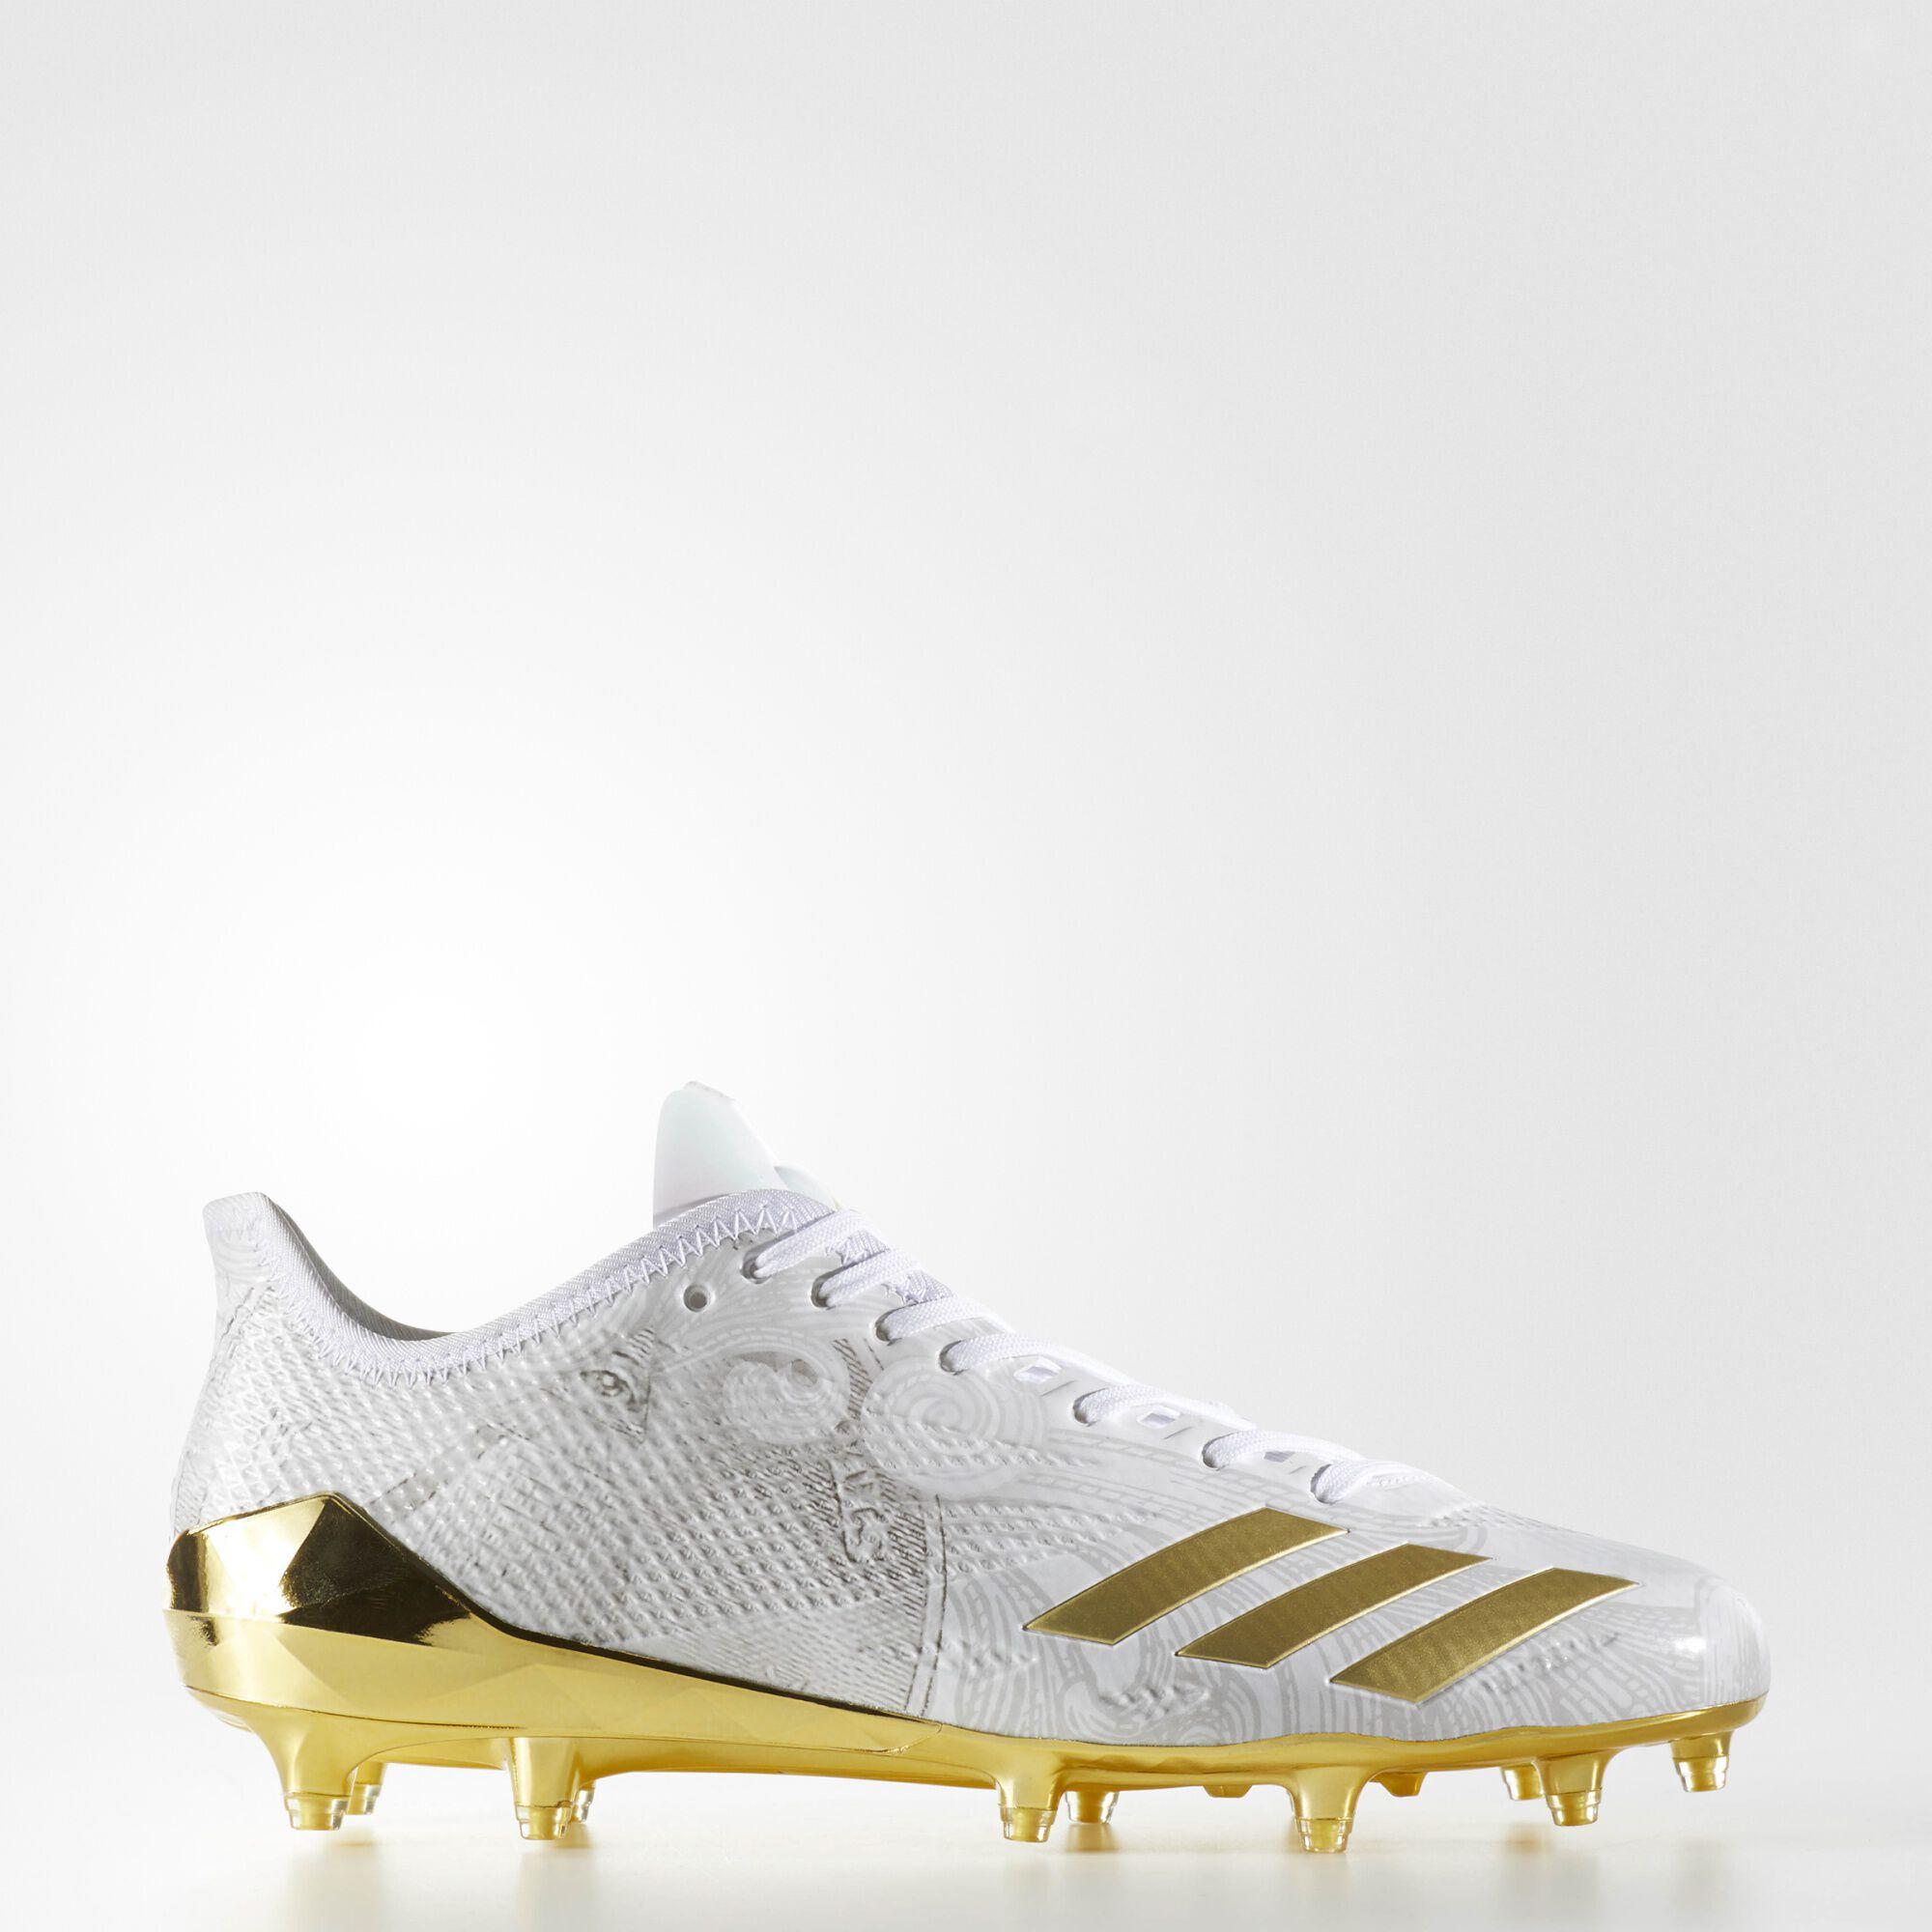 adidas football cleats on sale >off47% di sconti